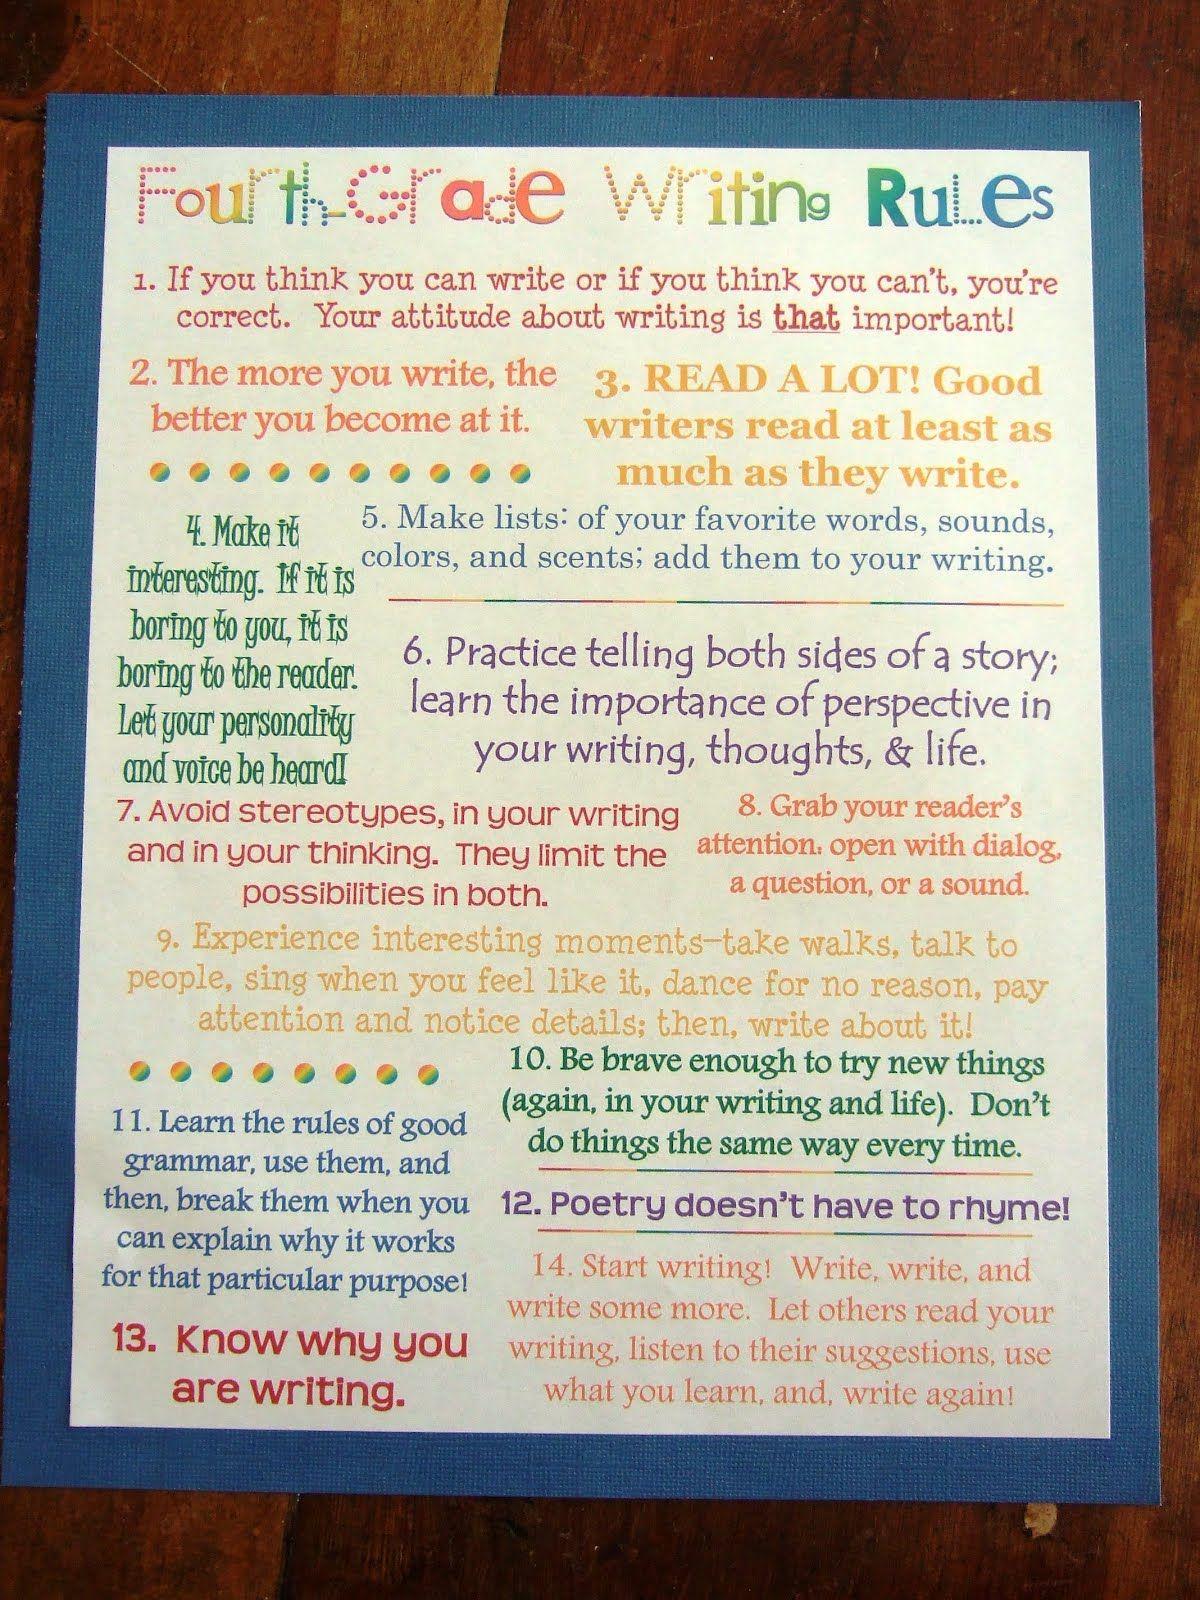 th grade writing rules language arts purpose 4th grade writing rules